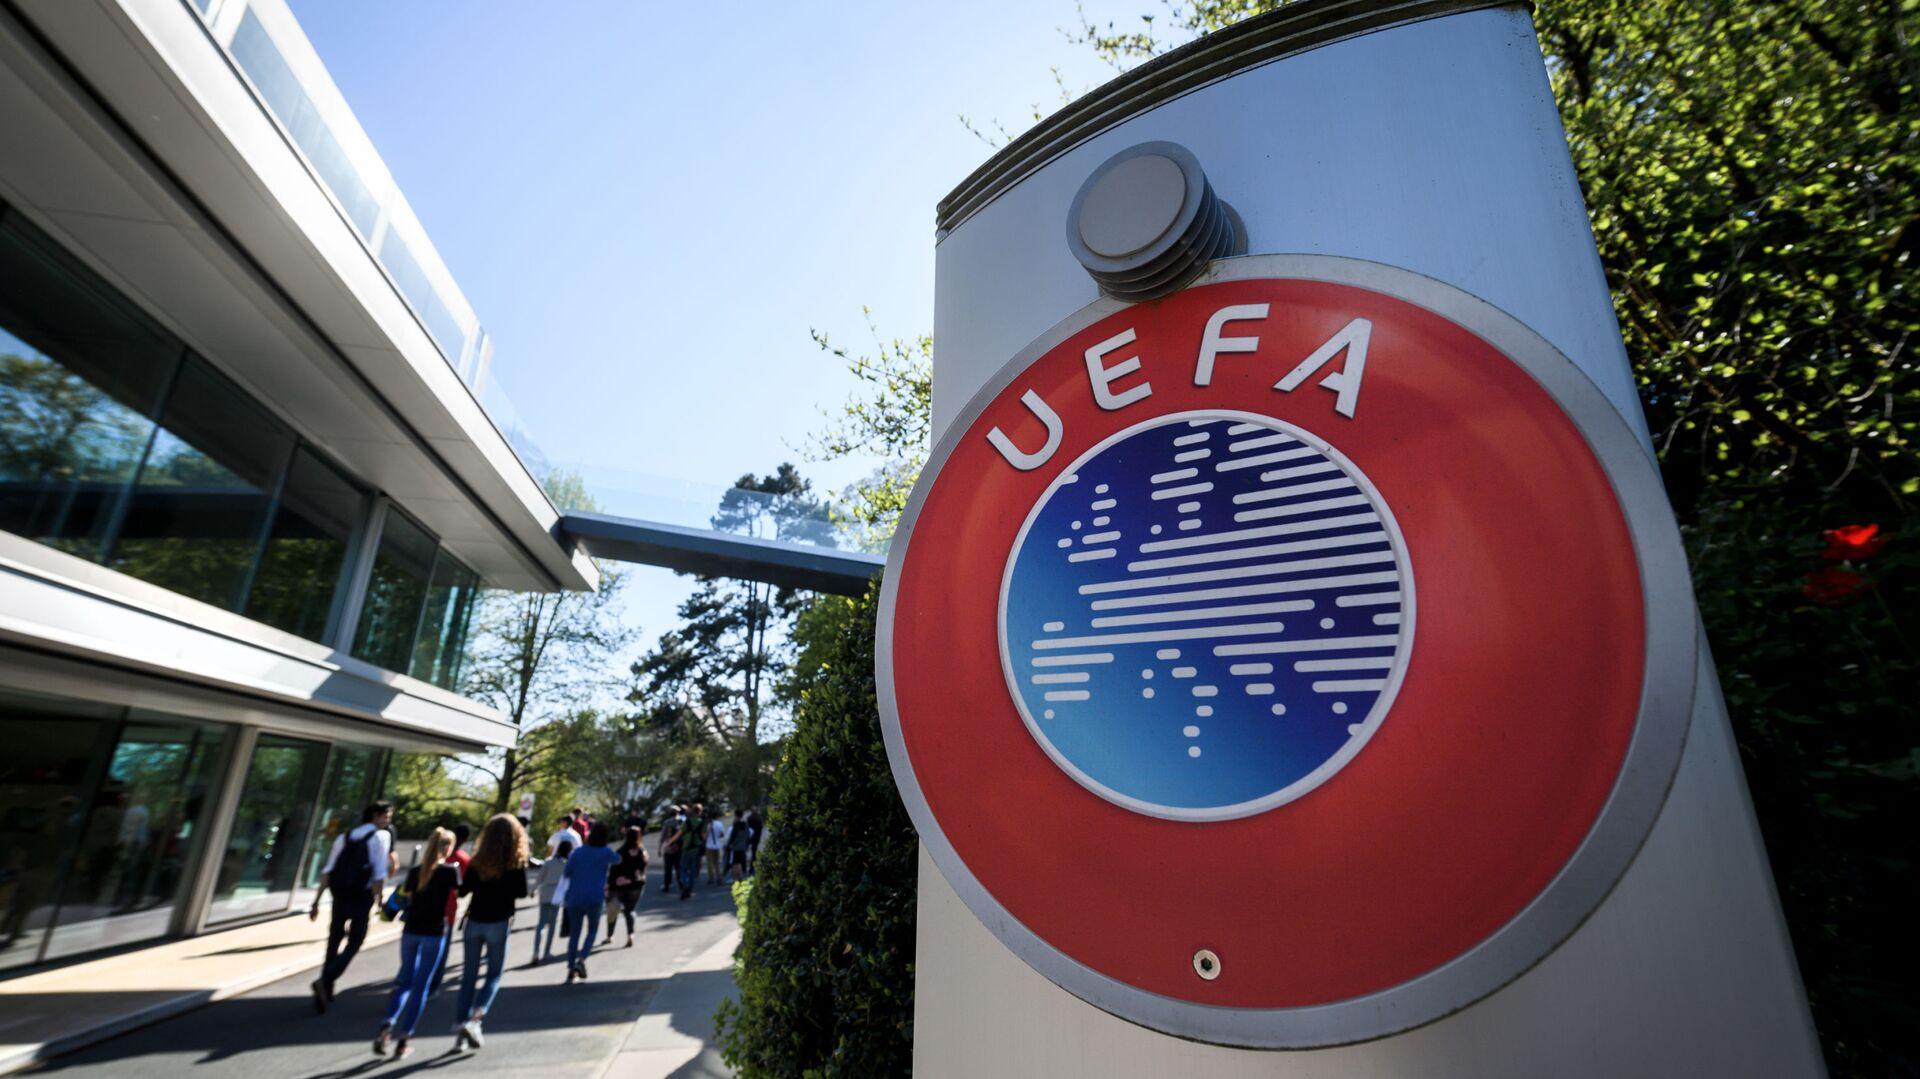 Штаб-квартира УЕФА - РИА Новости, 1920, 15.10.2019